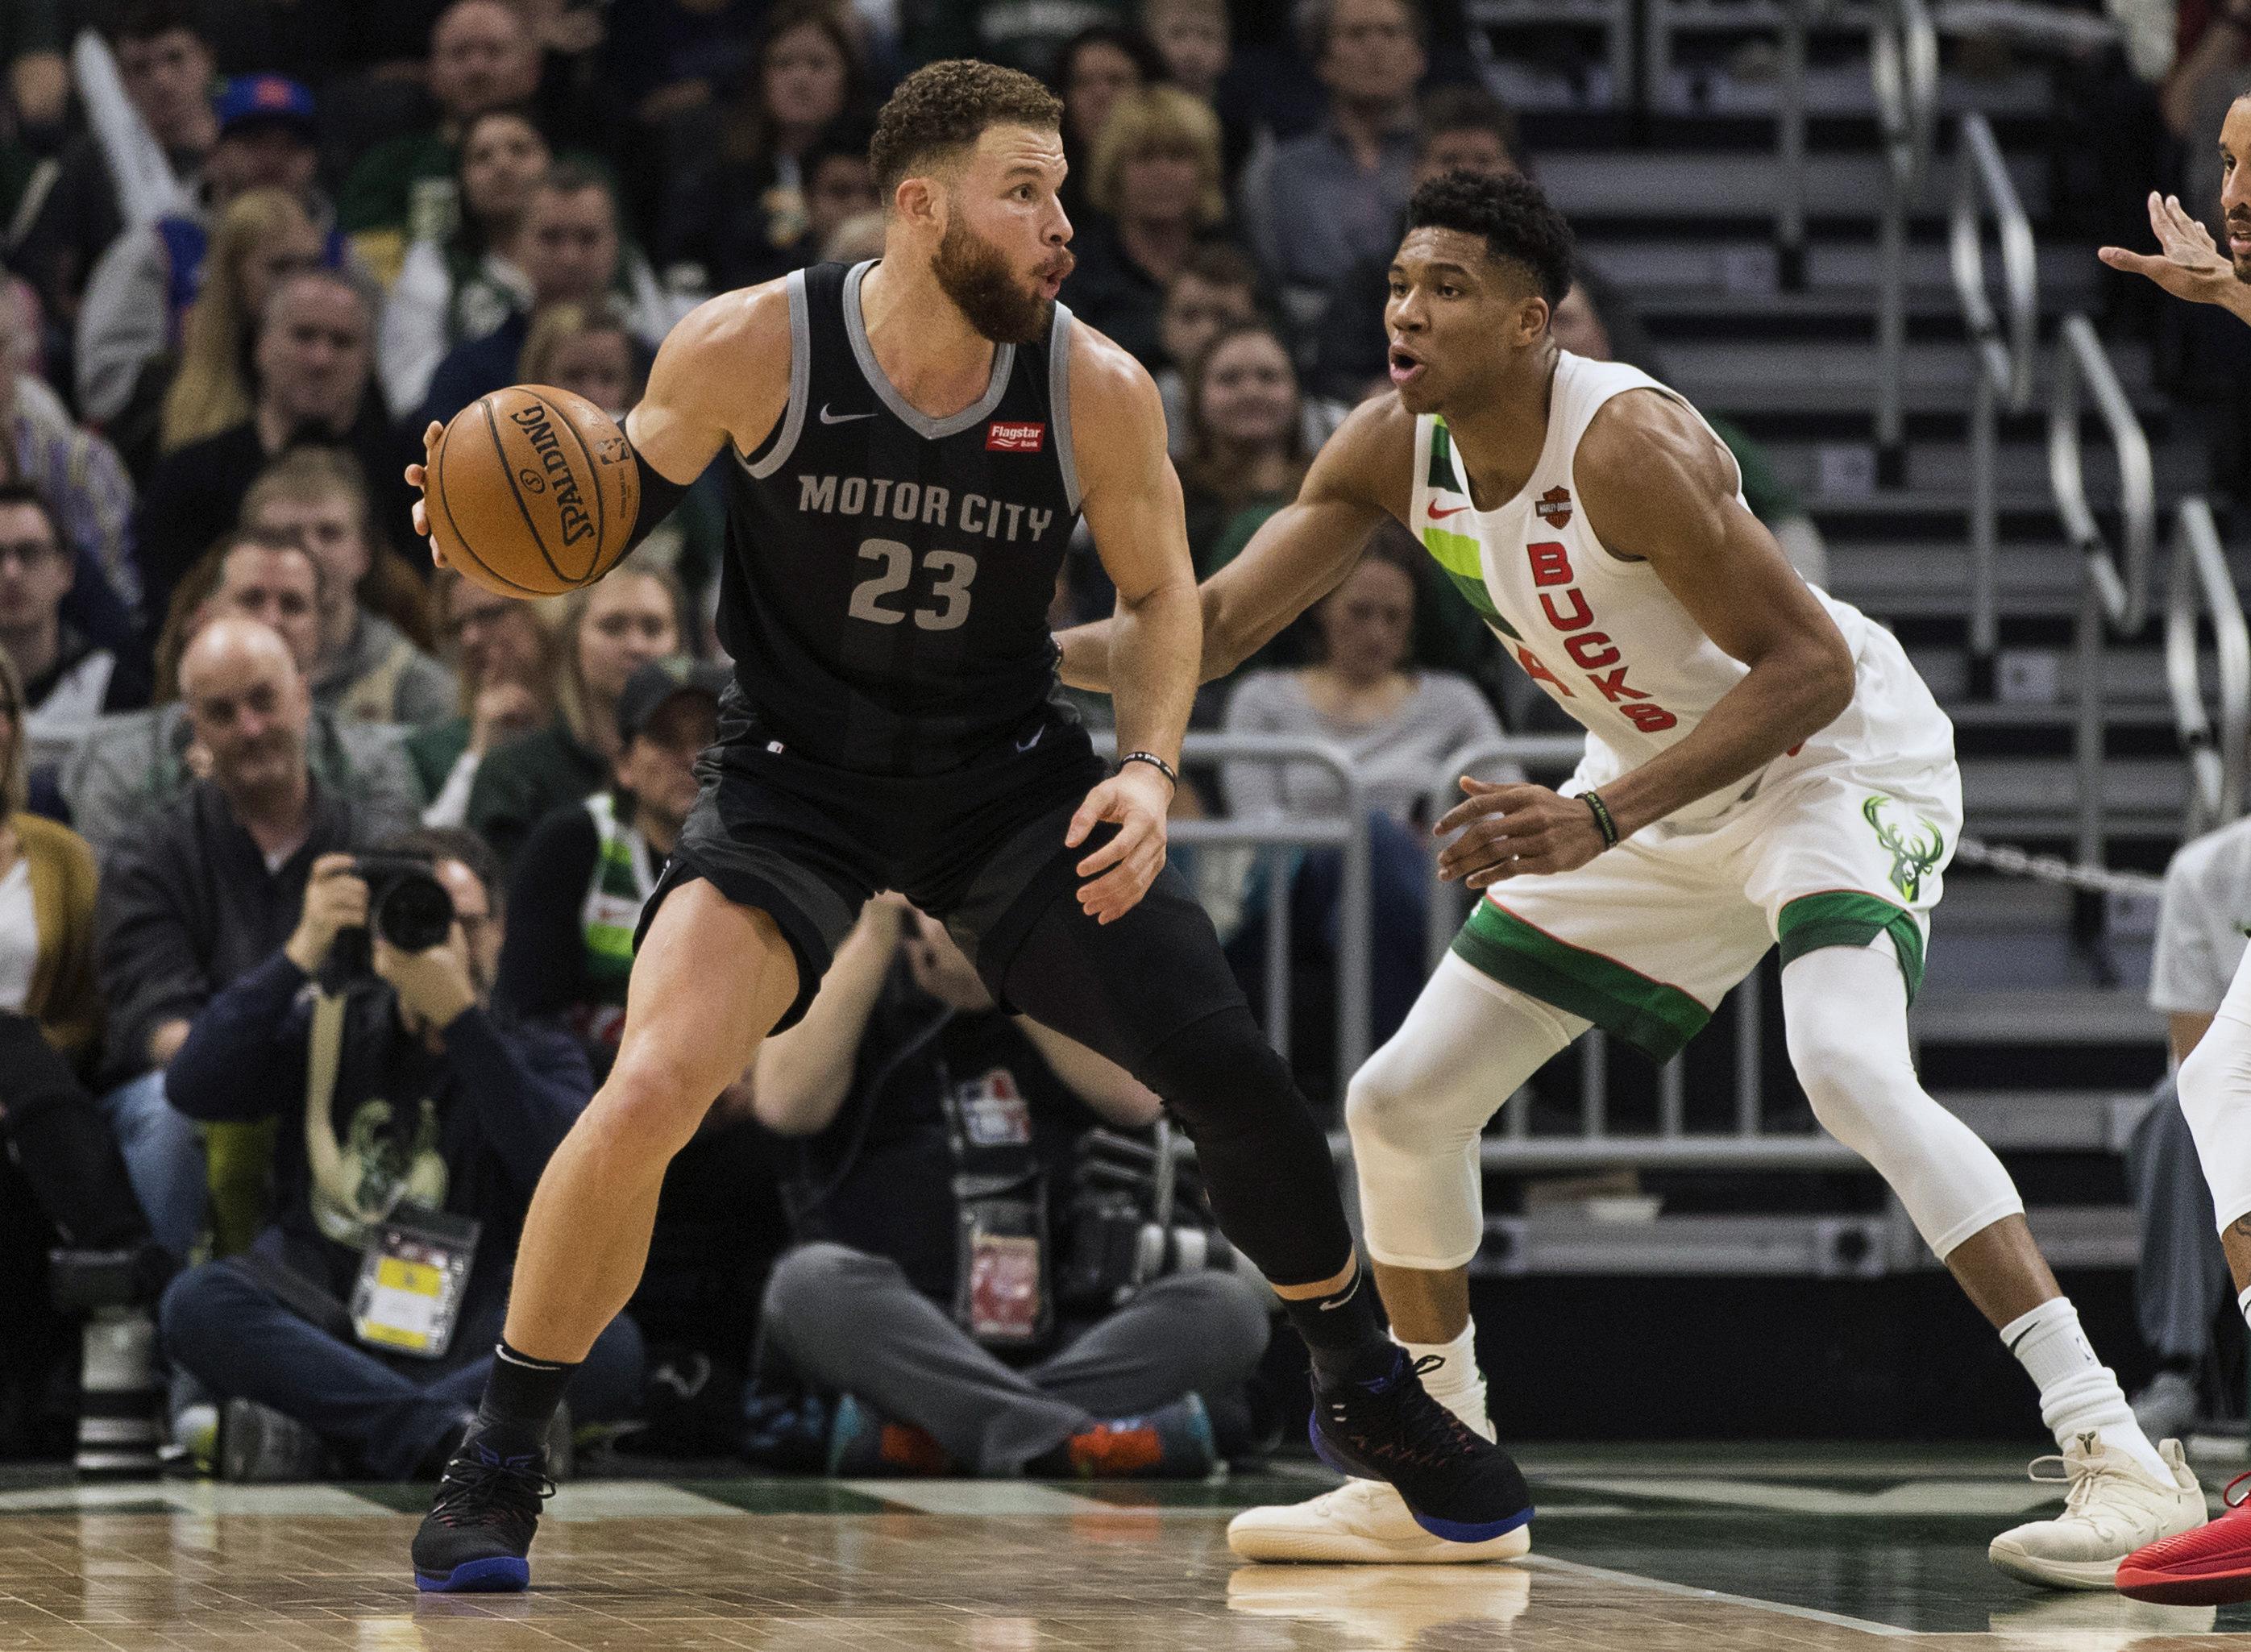 Playoff Preview: Detroit Pistons vs. Milwaukee Bucks